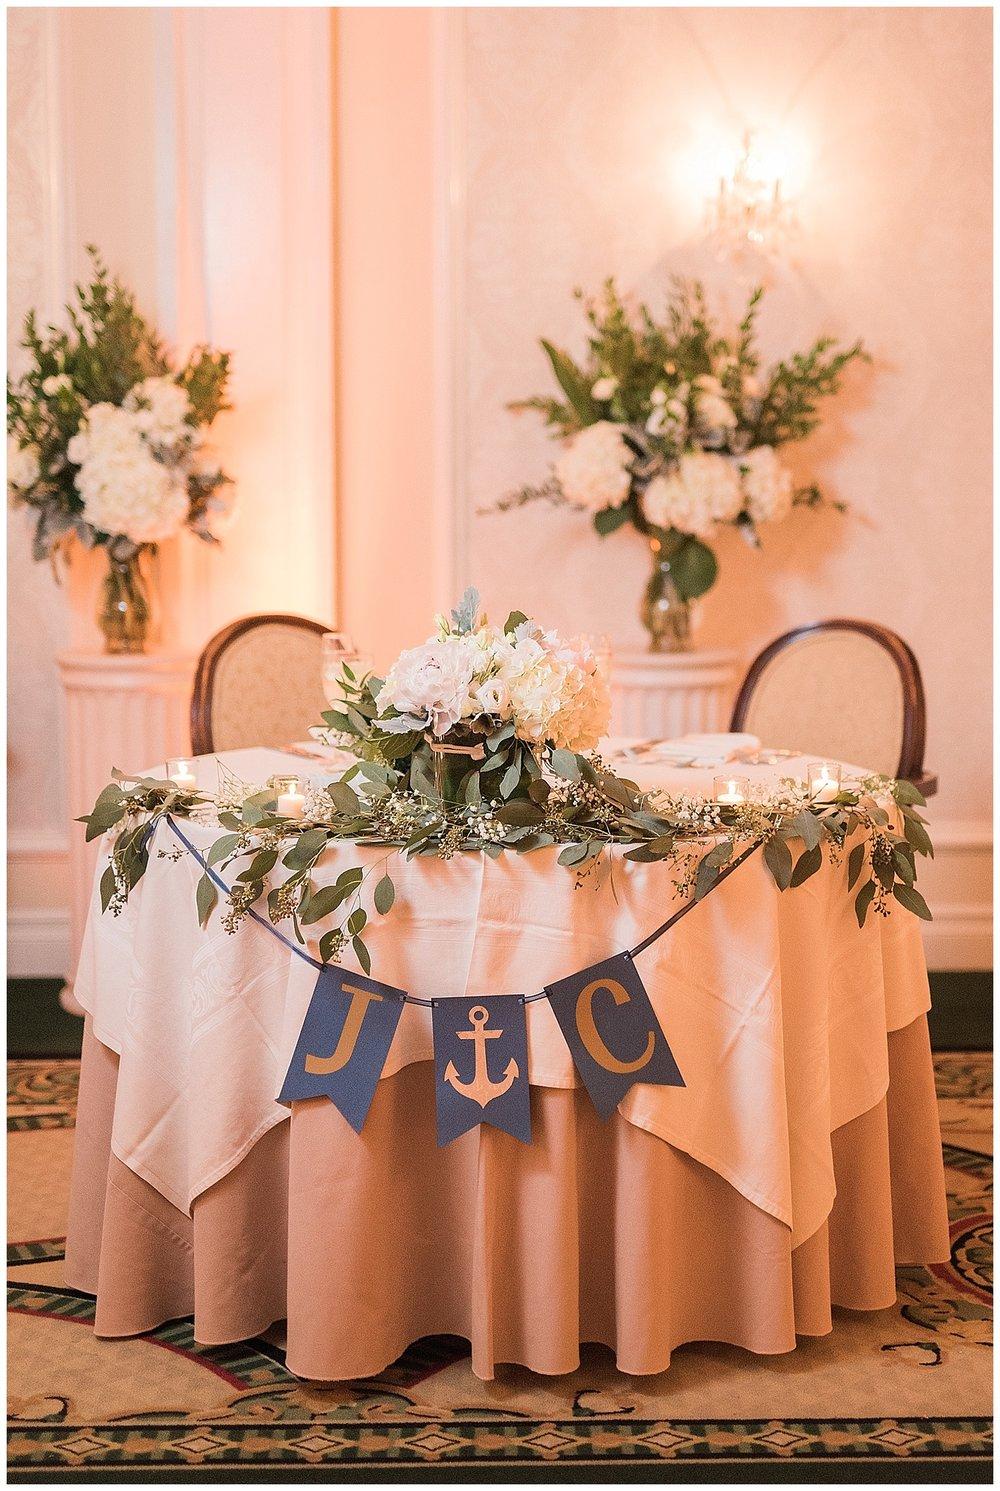 New Jersey Weddings | Molly Pitcher Inn | www.redoakweddings.com